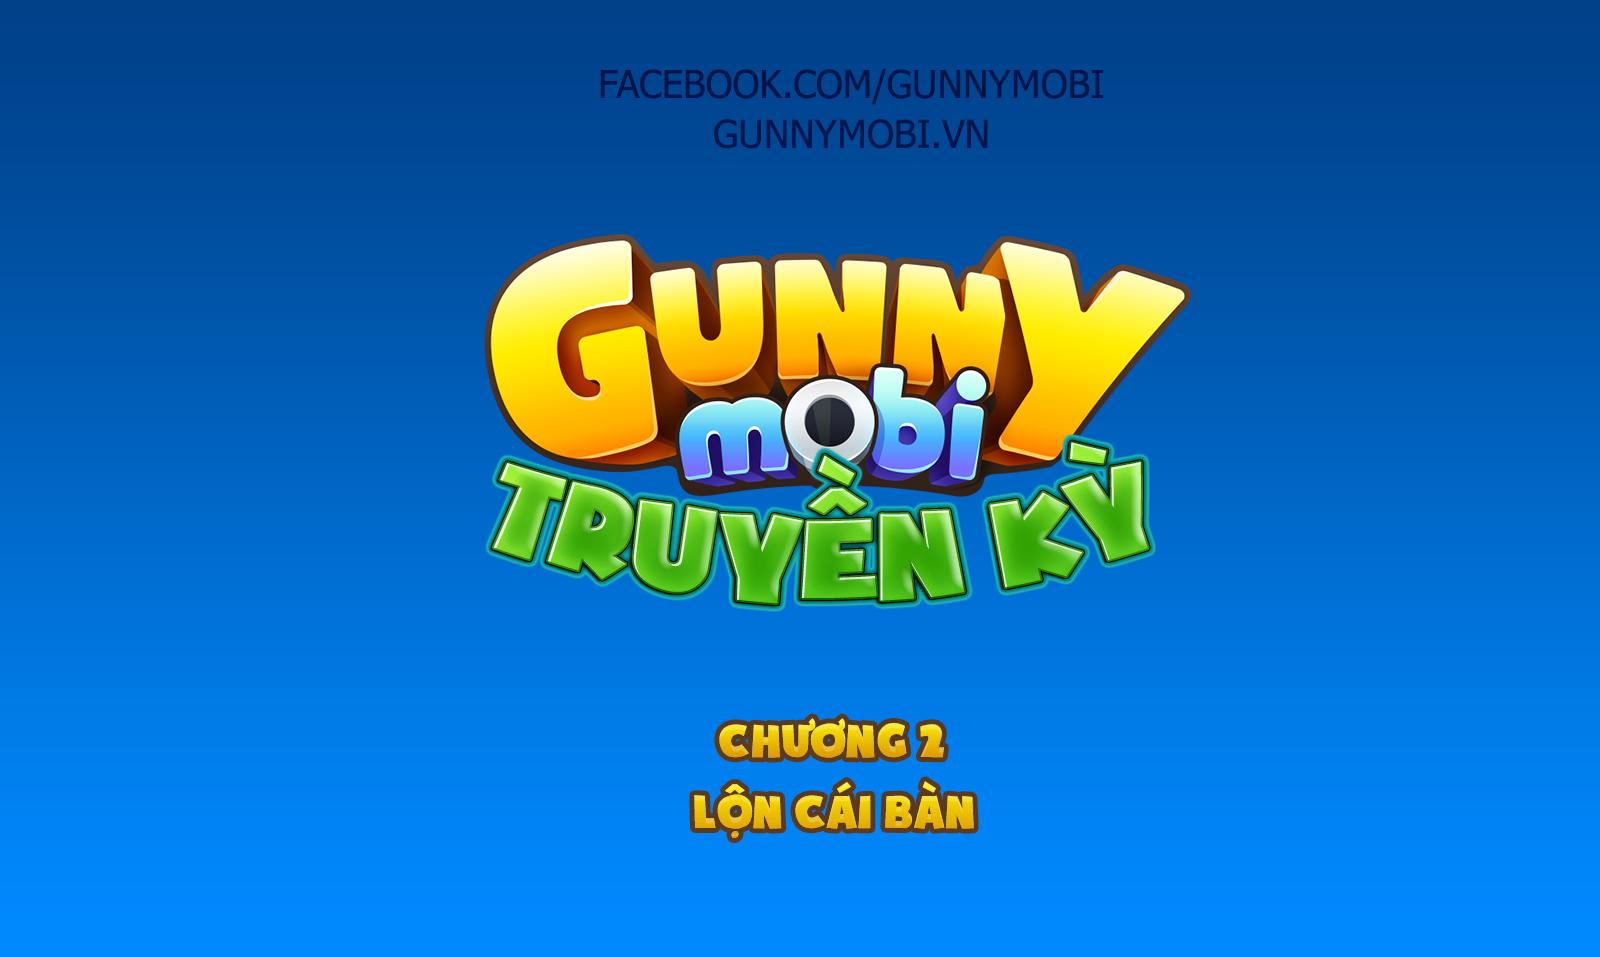 [Truyện Tranh] Gunny Mobi Truyền Kỳ - Kỳ 2